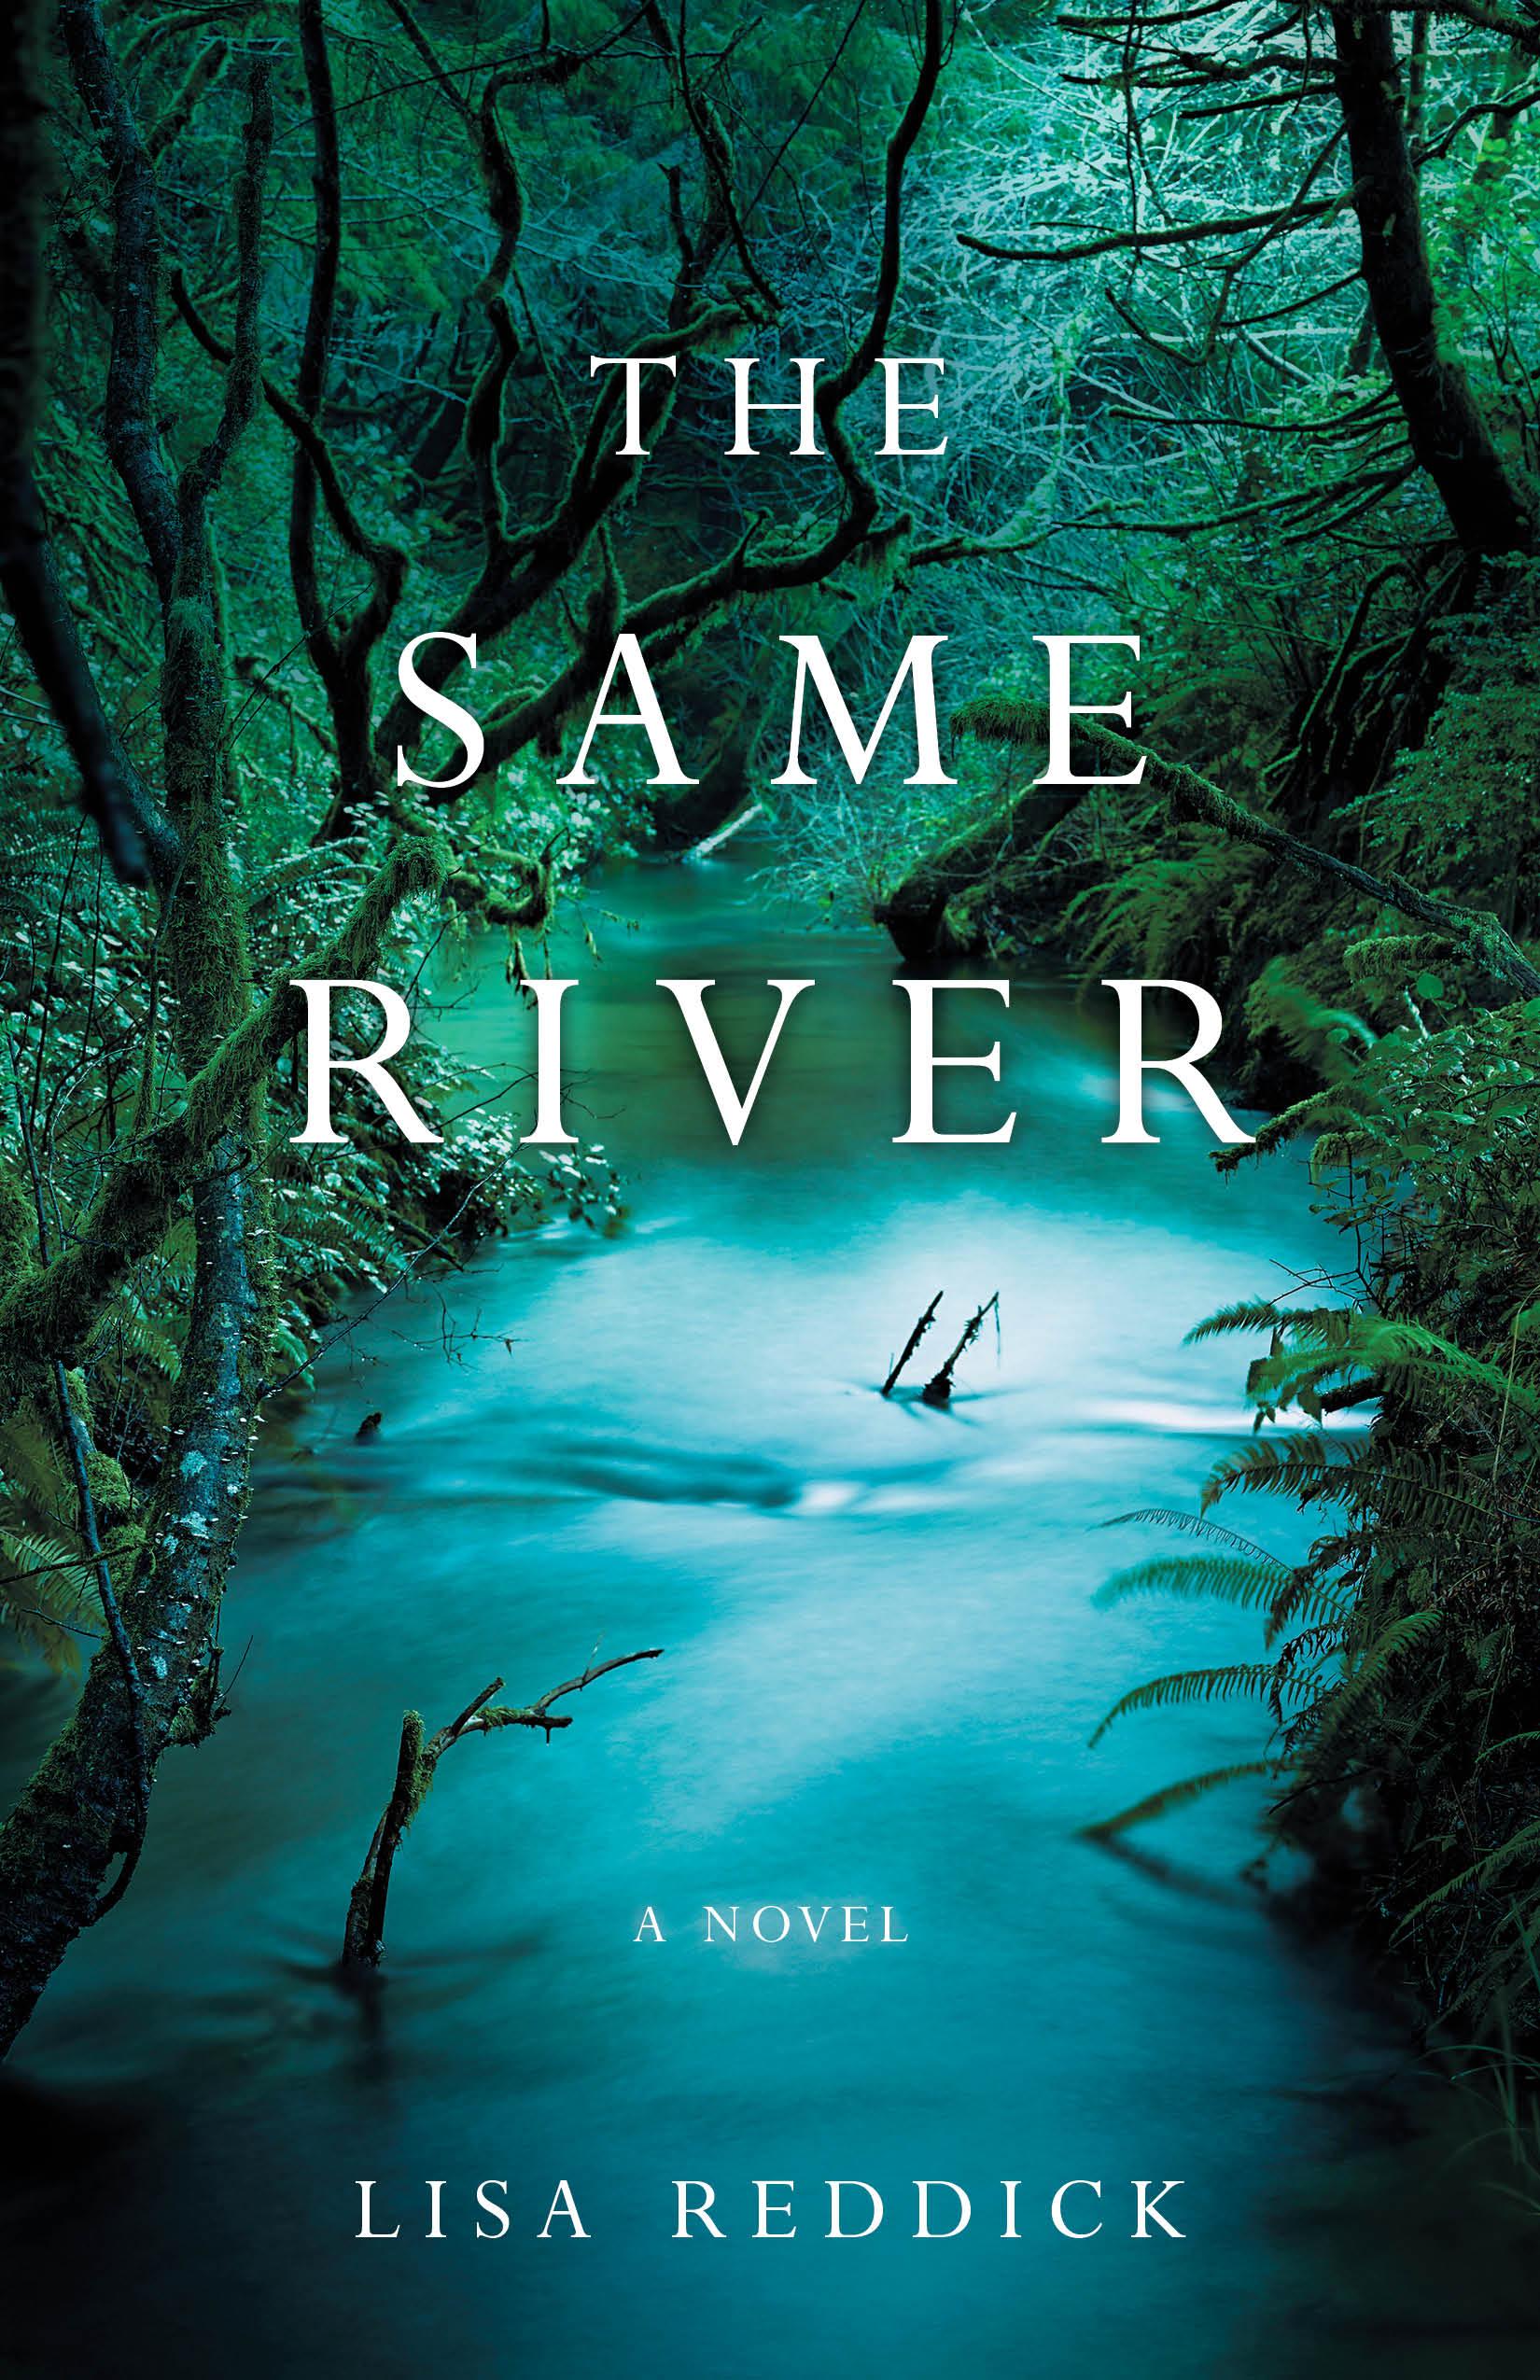 The Same River, by Lisa Reddick